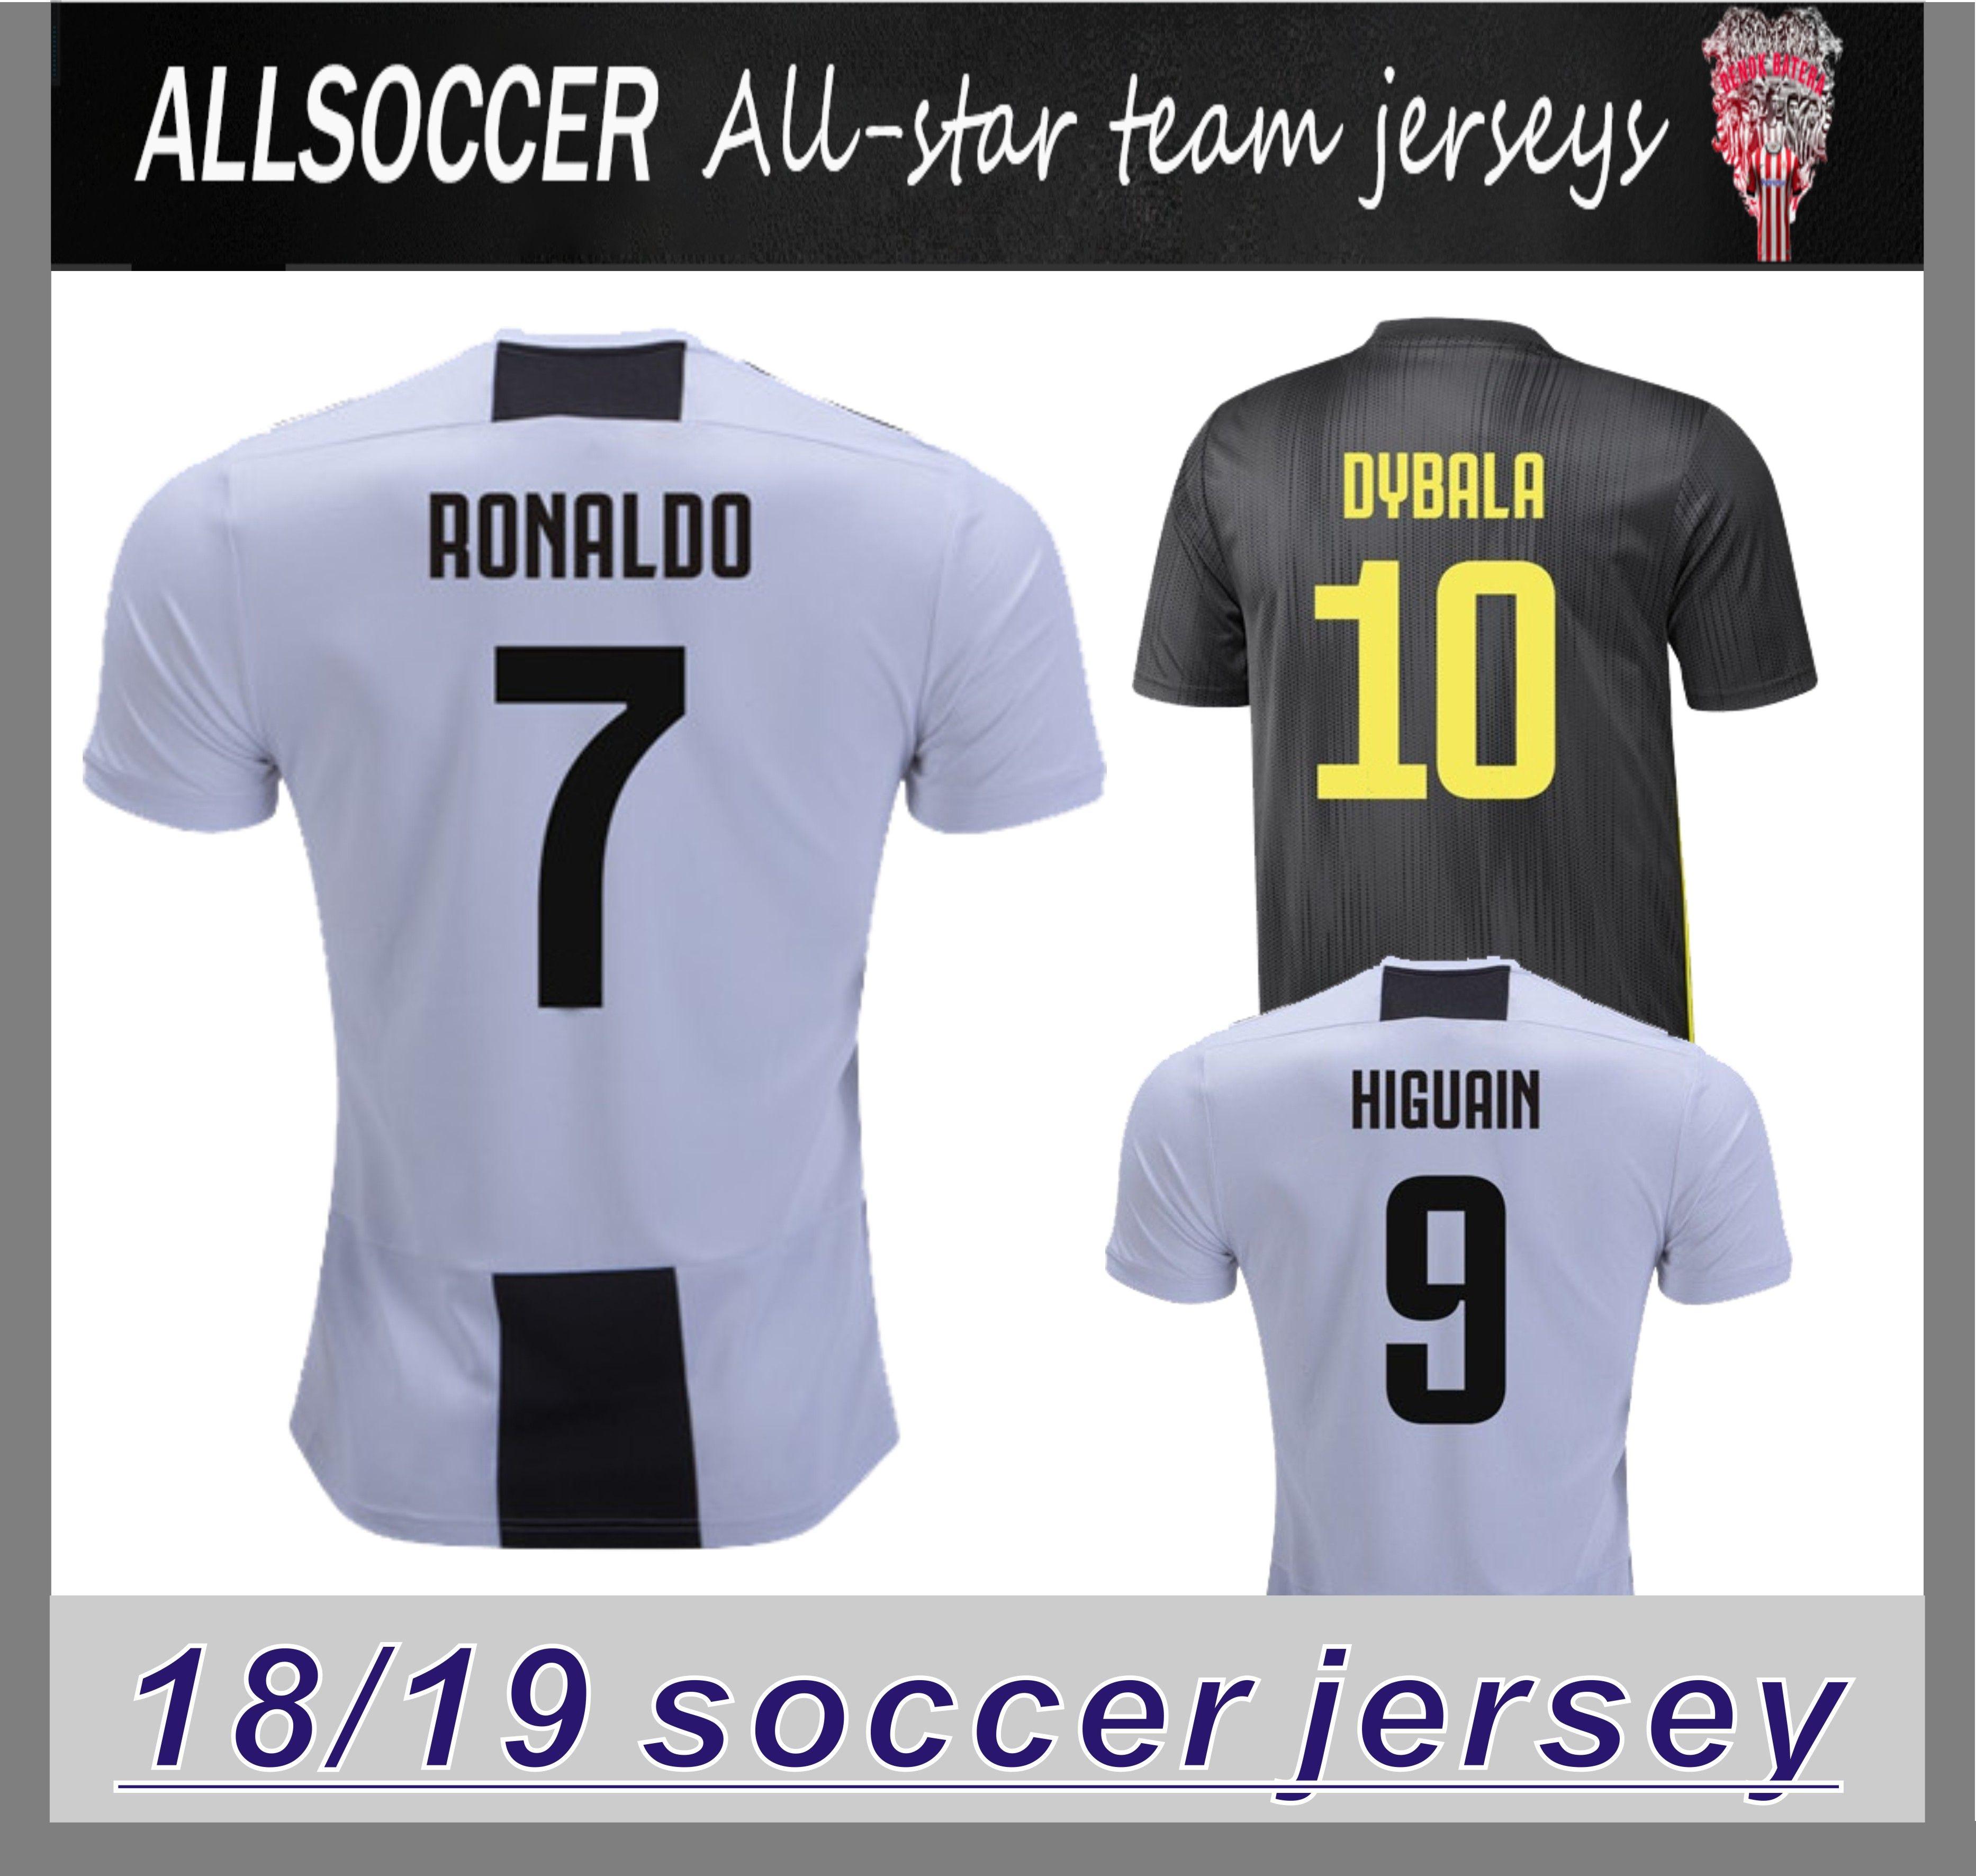 d37f97b33af 2019 7 RONALDO 18 19 Home And Away Soccer Jerseys Dybala HIGUAIN Tshirts  CHIELLINI Costa KHEDIRA Cuadrado PJANIC Manzukic 2019 Top Quality Jersey  From ...